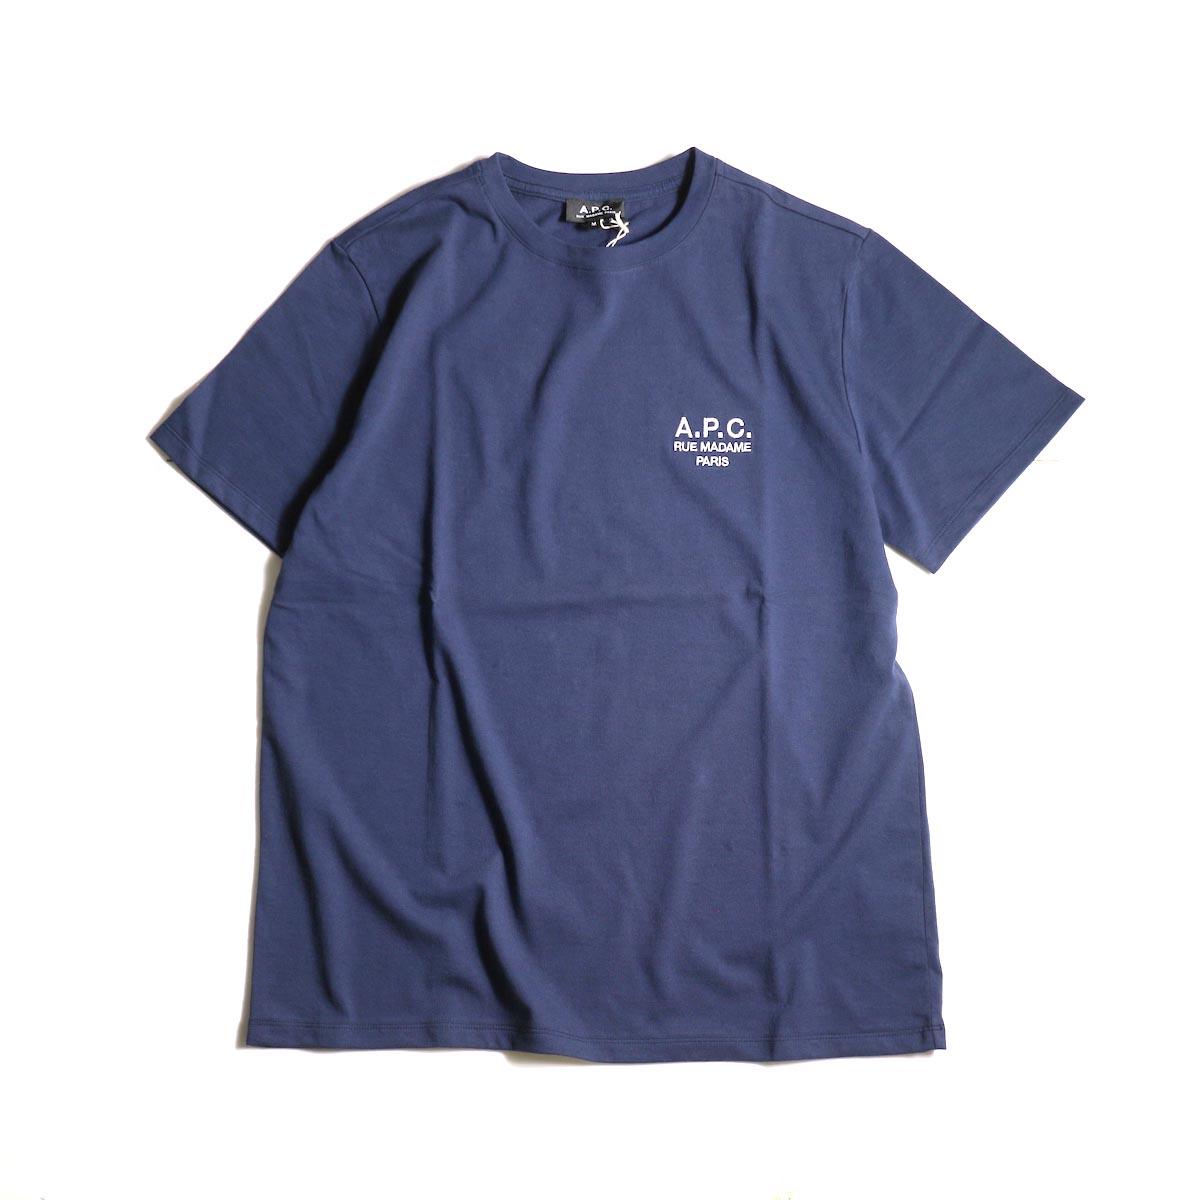 A.P.C. / Crew Neck Tee (Raymond T-shirt) -Navy